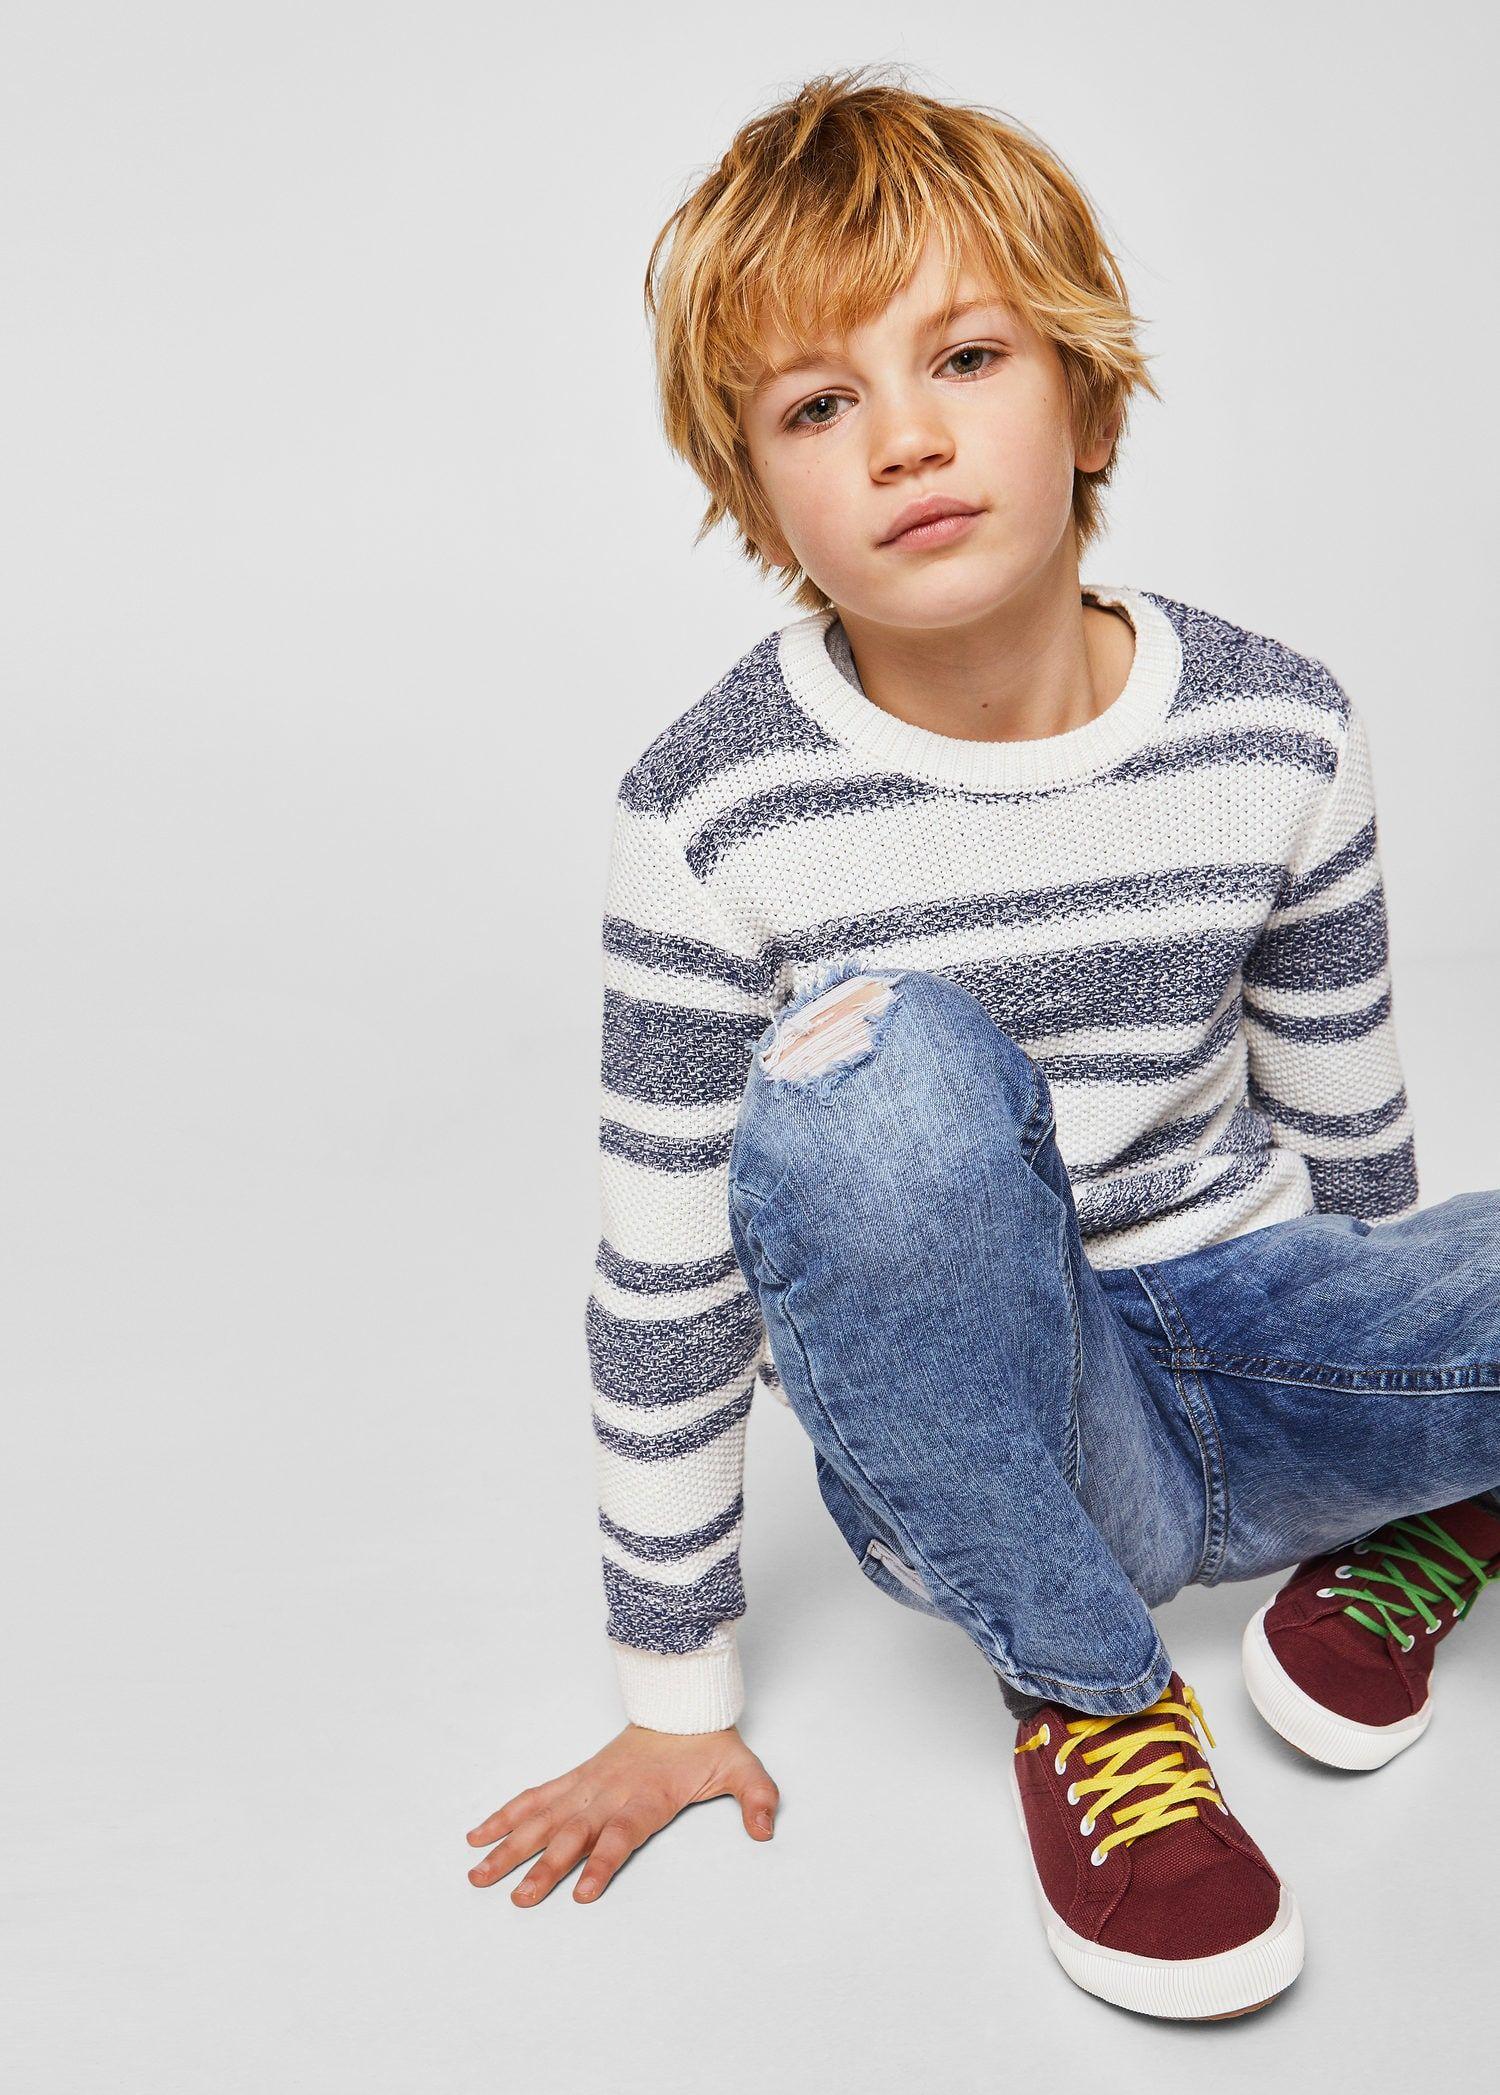 Light Wash Skinny Jeans Boys Bairn Boys Jeans Kids